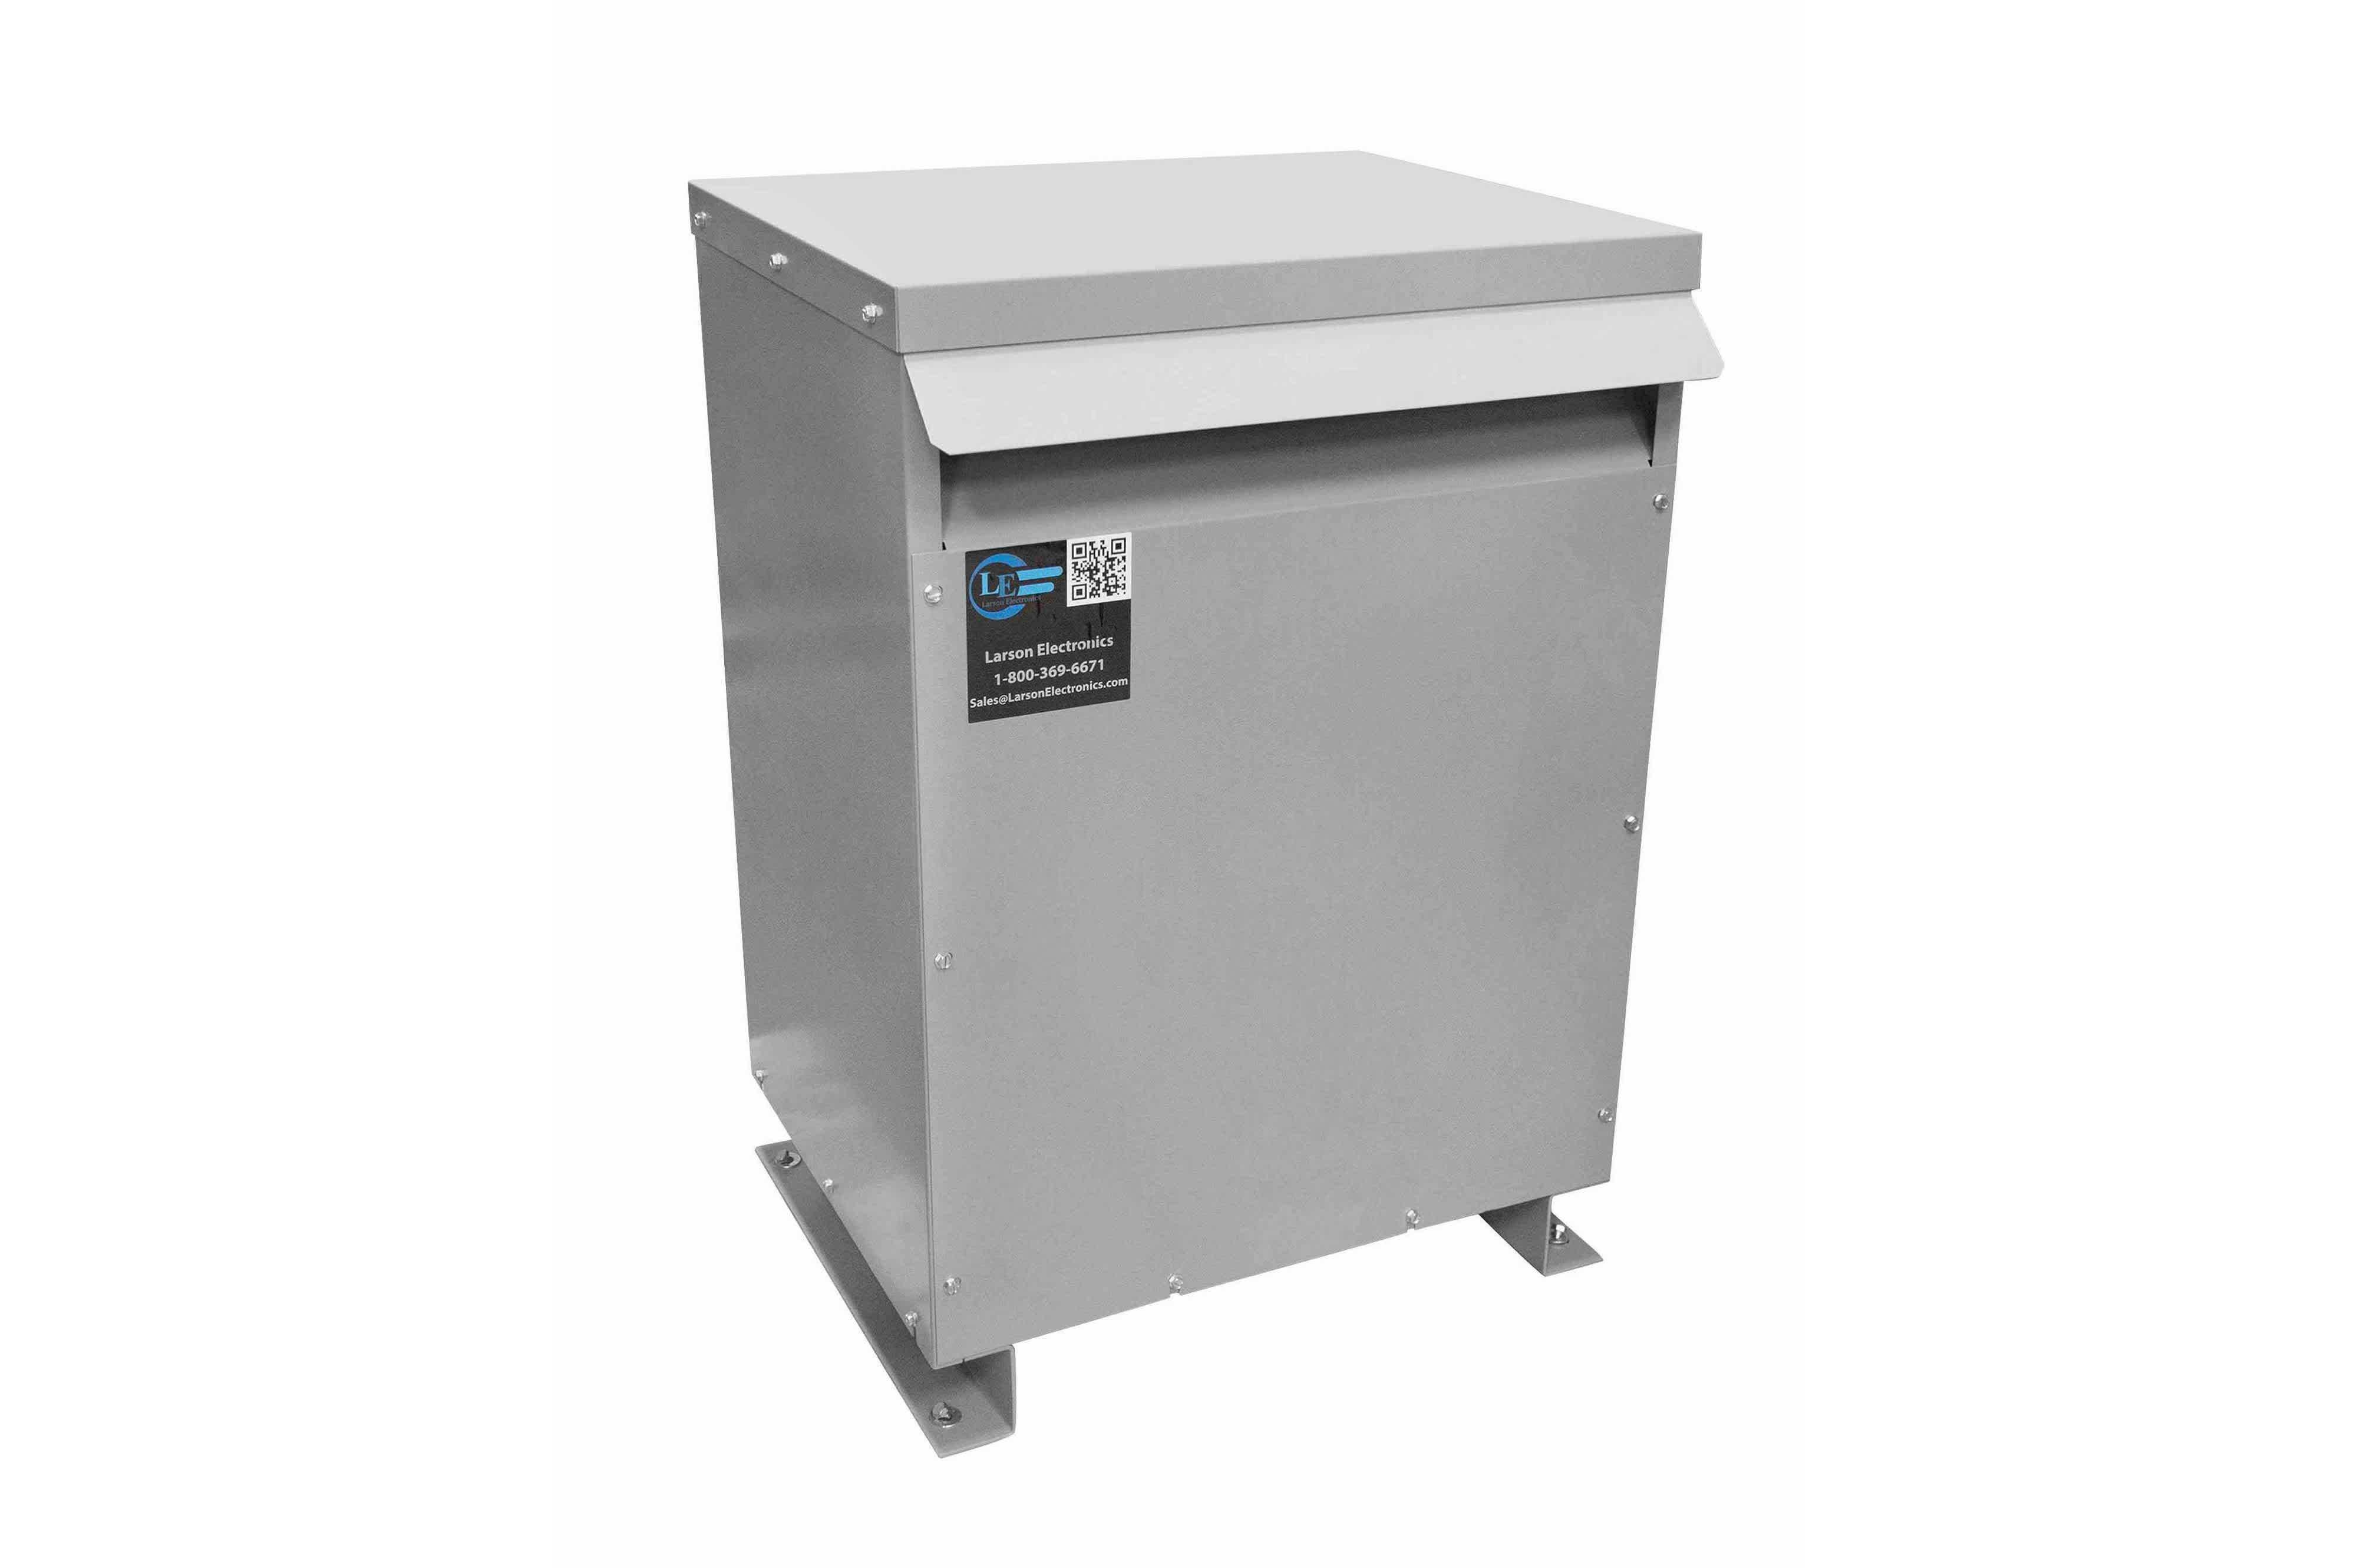 800 kVA 3PH DOE Transformer, 380V Delta Primary, 208Y/120 Wye-N Secondary, N3R, Ventilated, 60 Hz